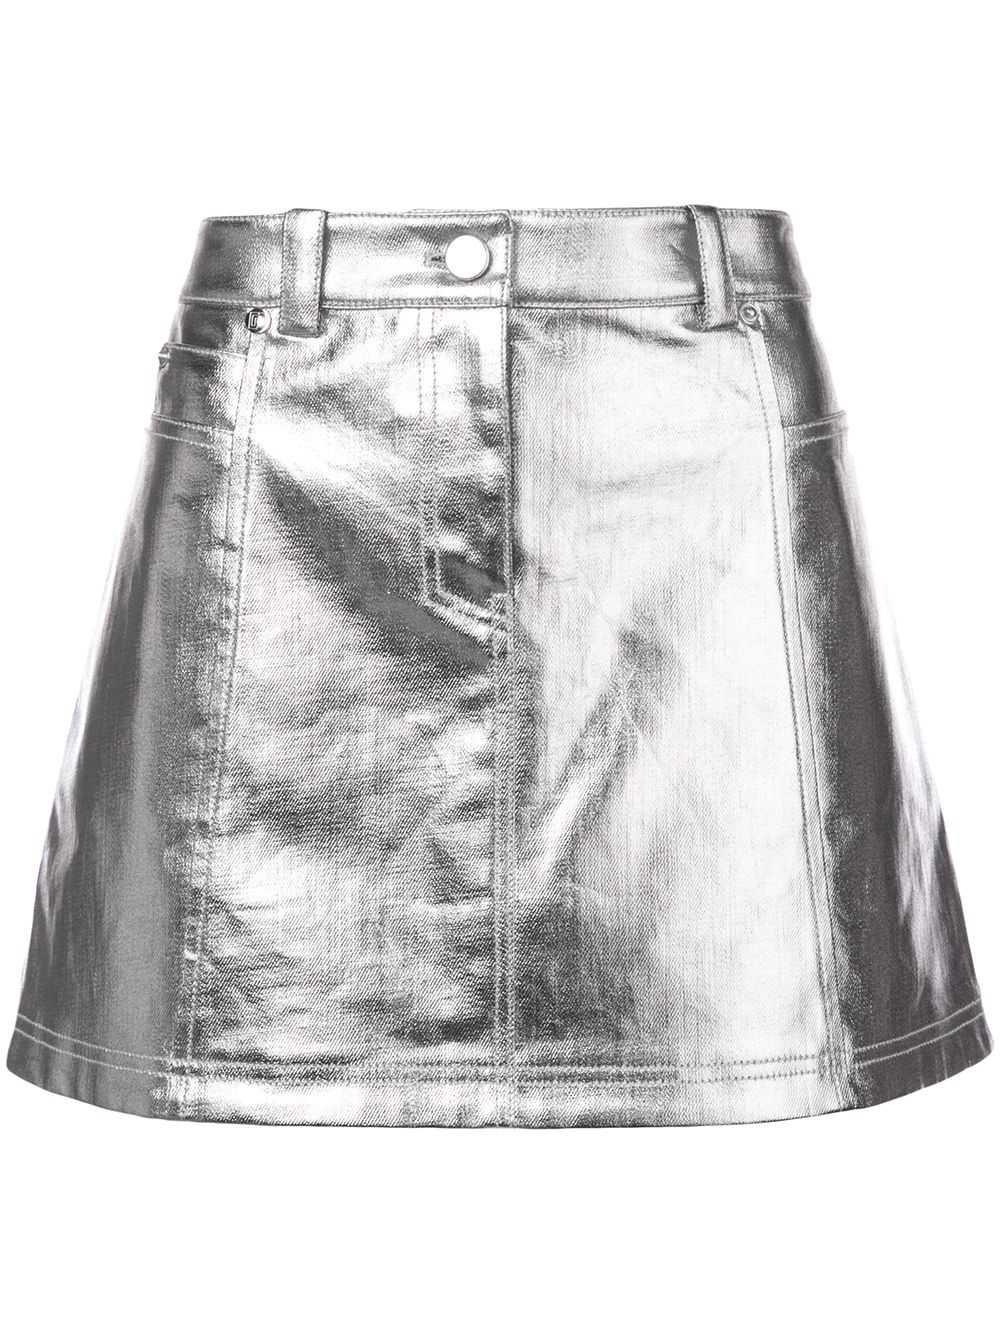 Paco Rabanne Metallic Mini Skirt - Farfetch